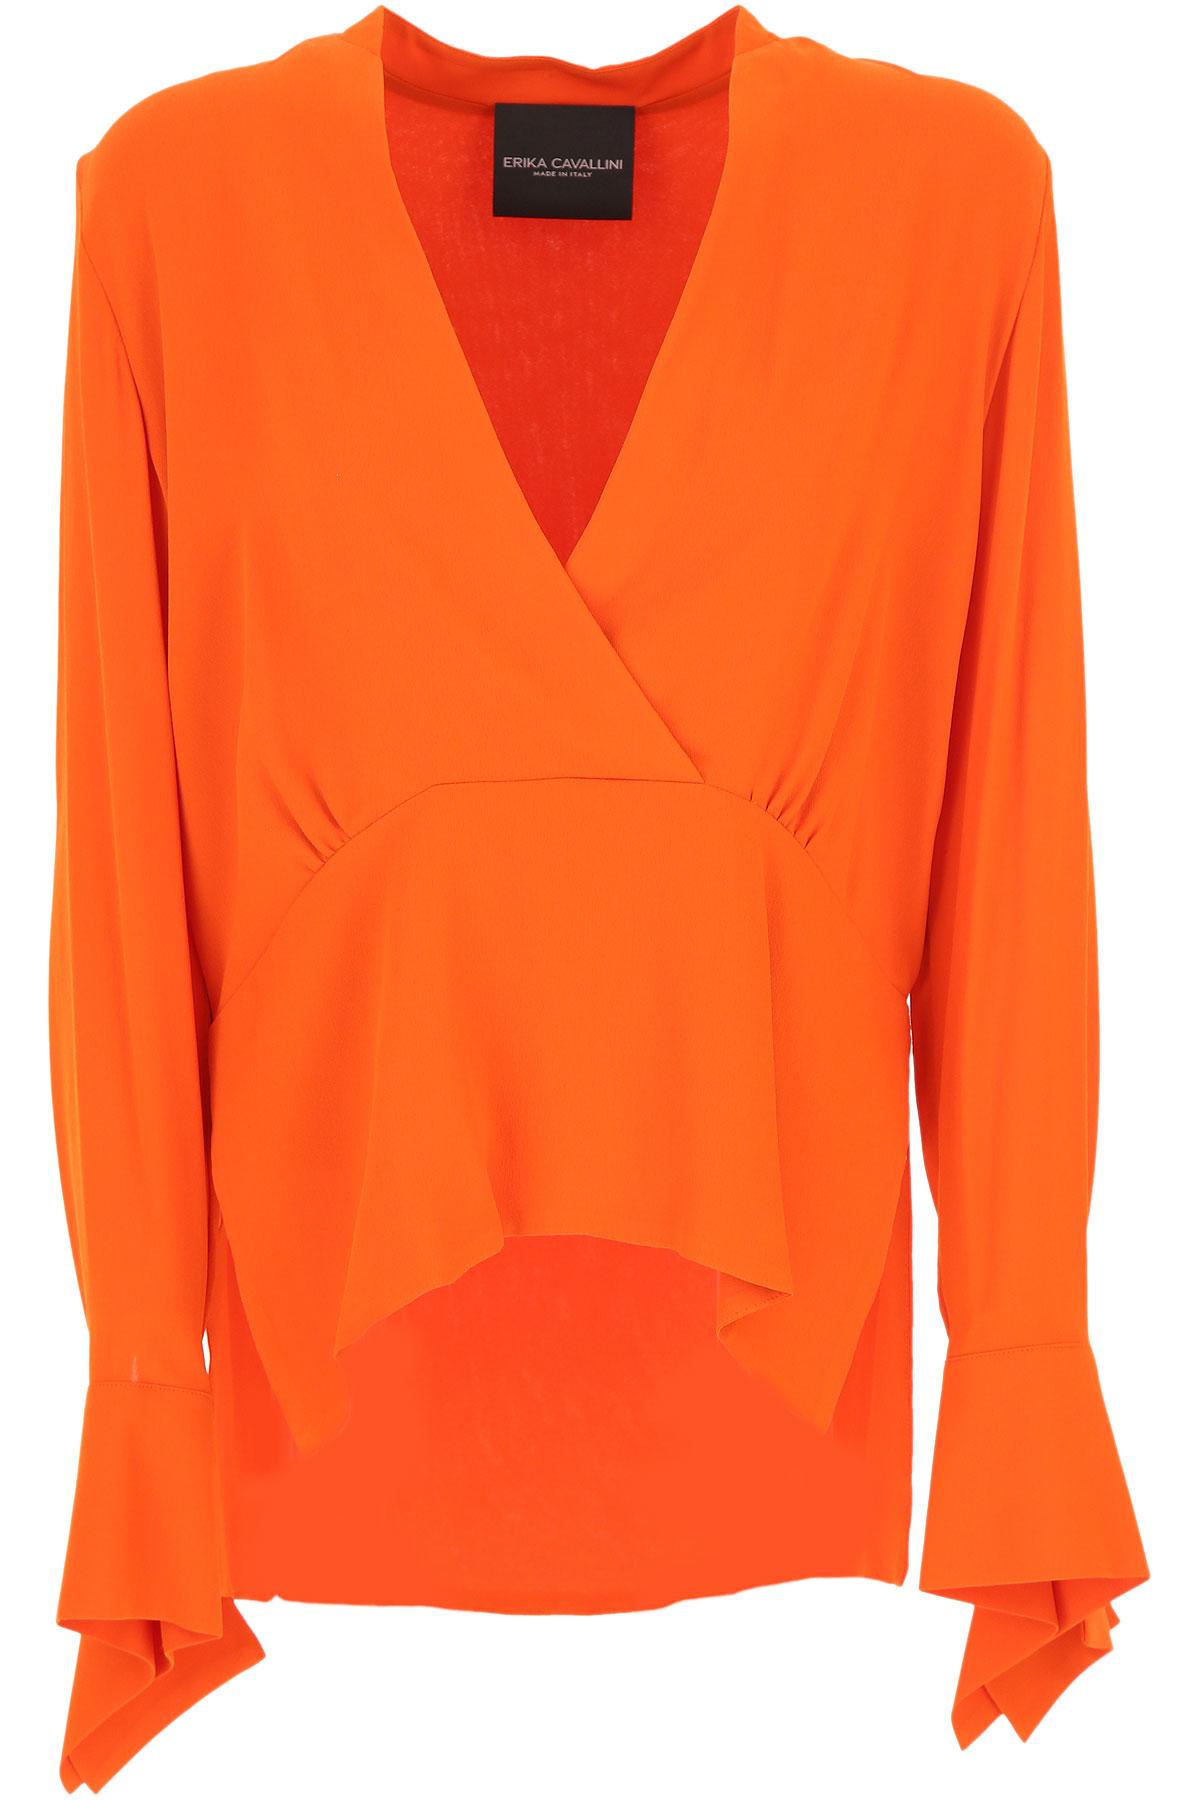 Erika Cavallini Top for Women On Sale, Orange, viscosa, 2019, 4 6